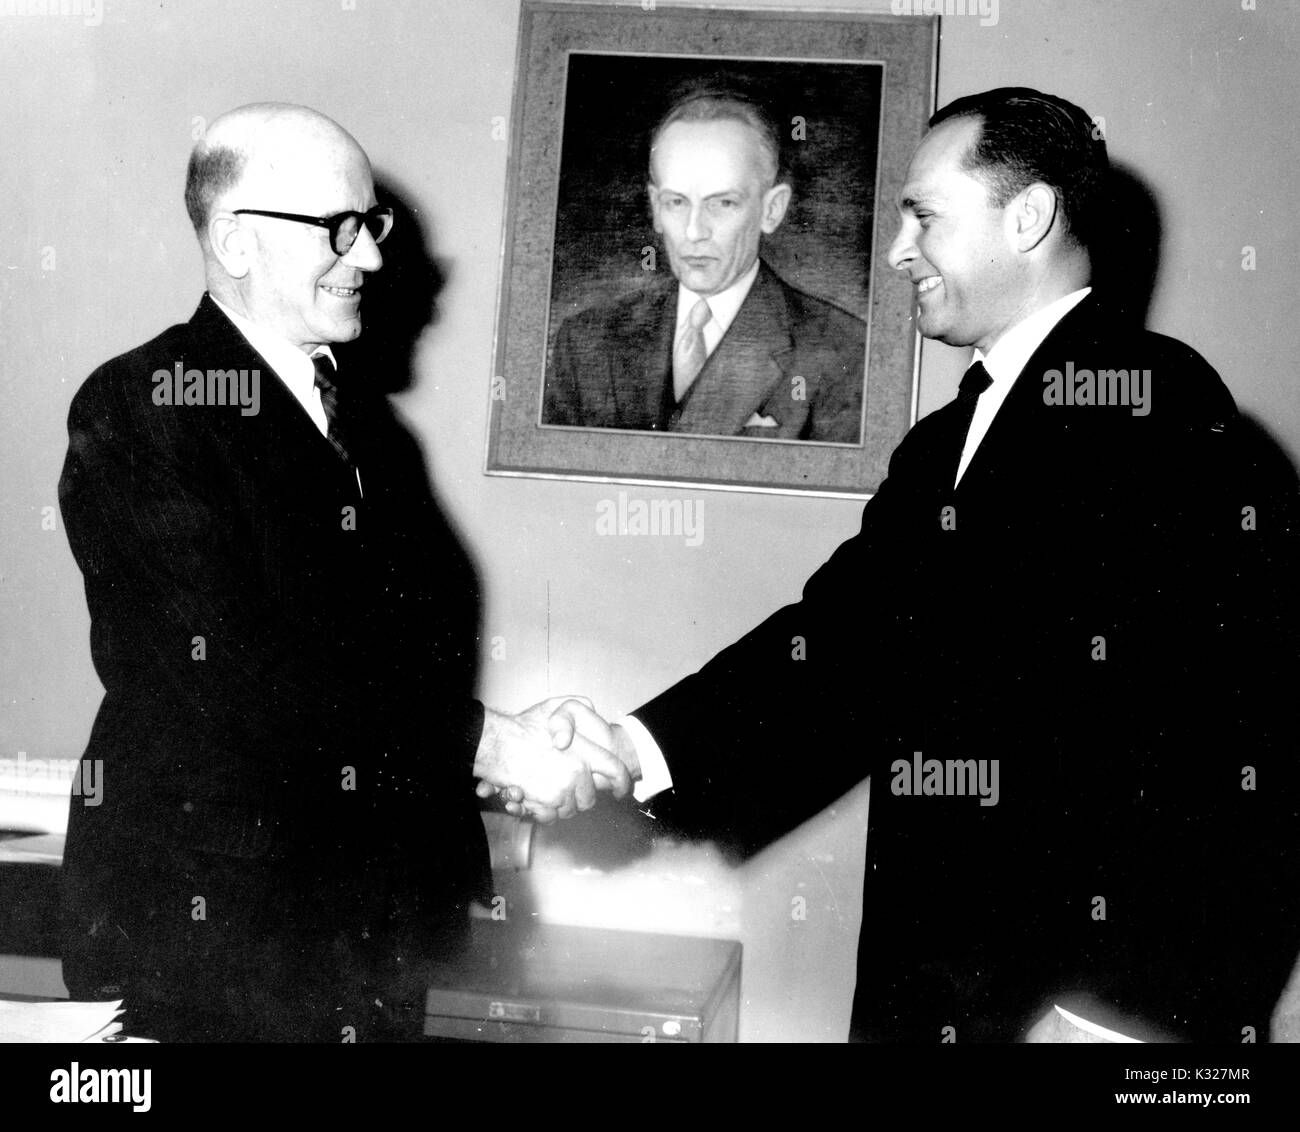 Colombian scholar, researcher, and professor in the humanities Ramon Eduardo De Zubiria (right) shakes hands with Jaime Samper, 1965. - Stock Image